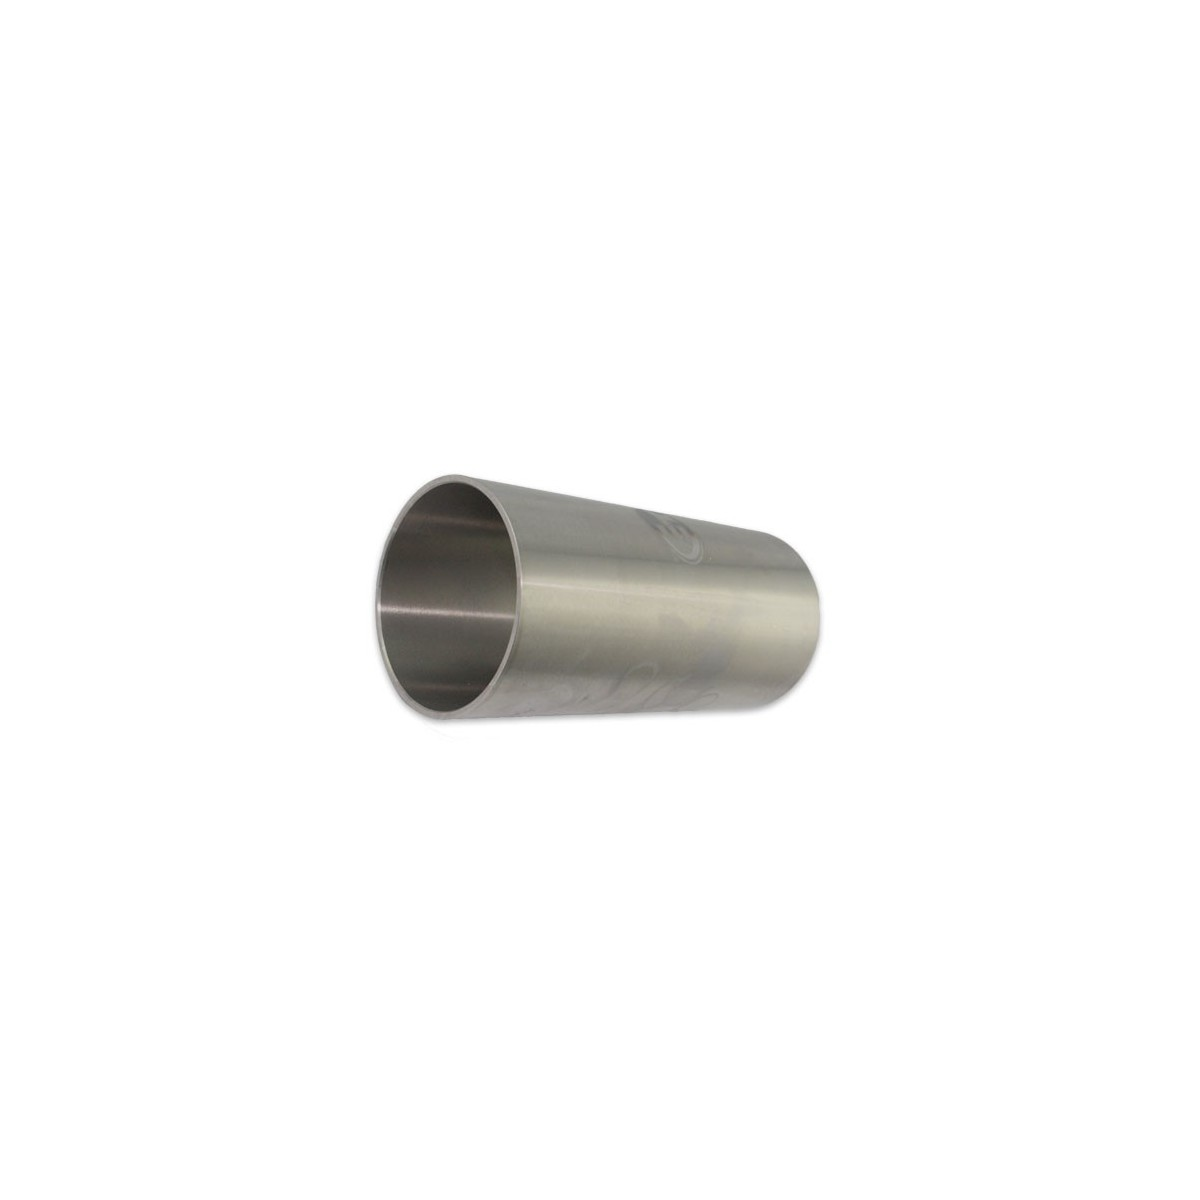 Cylinder Liner  Kubota L1500-L2000,L2201,L2600,L3001 76mm.